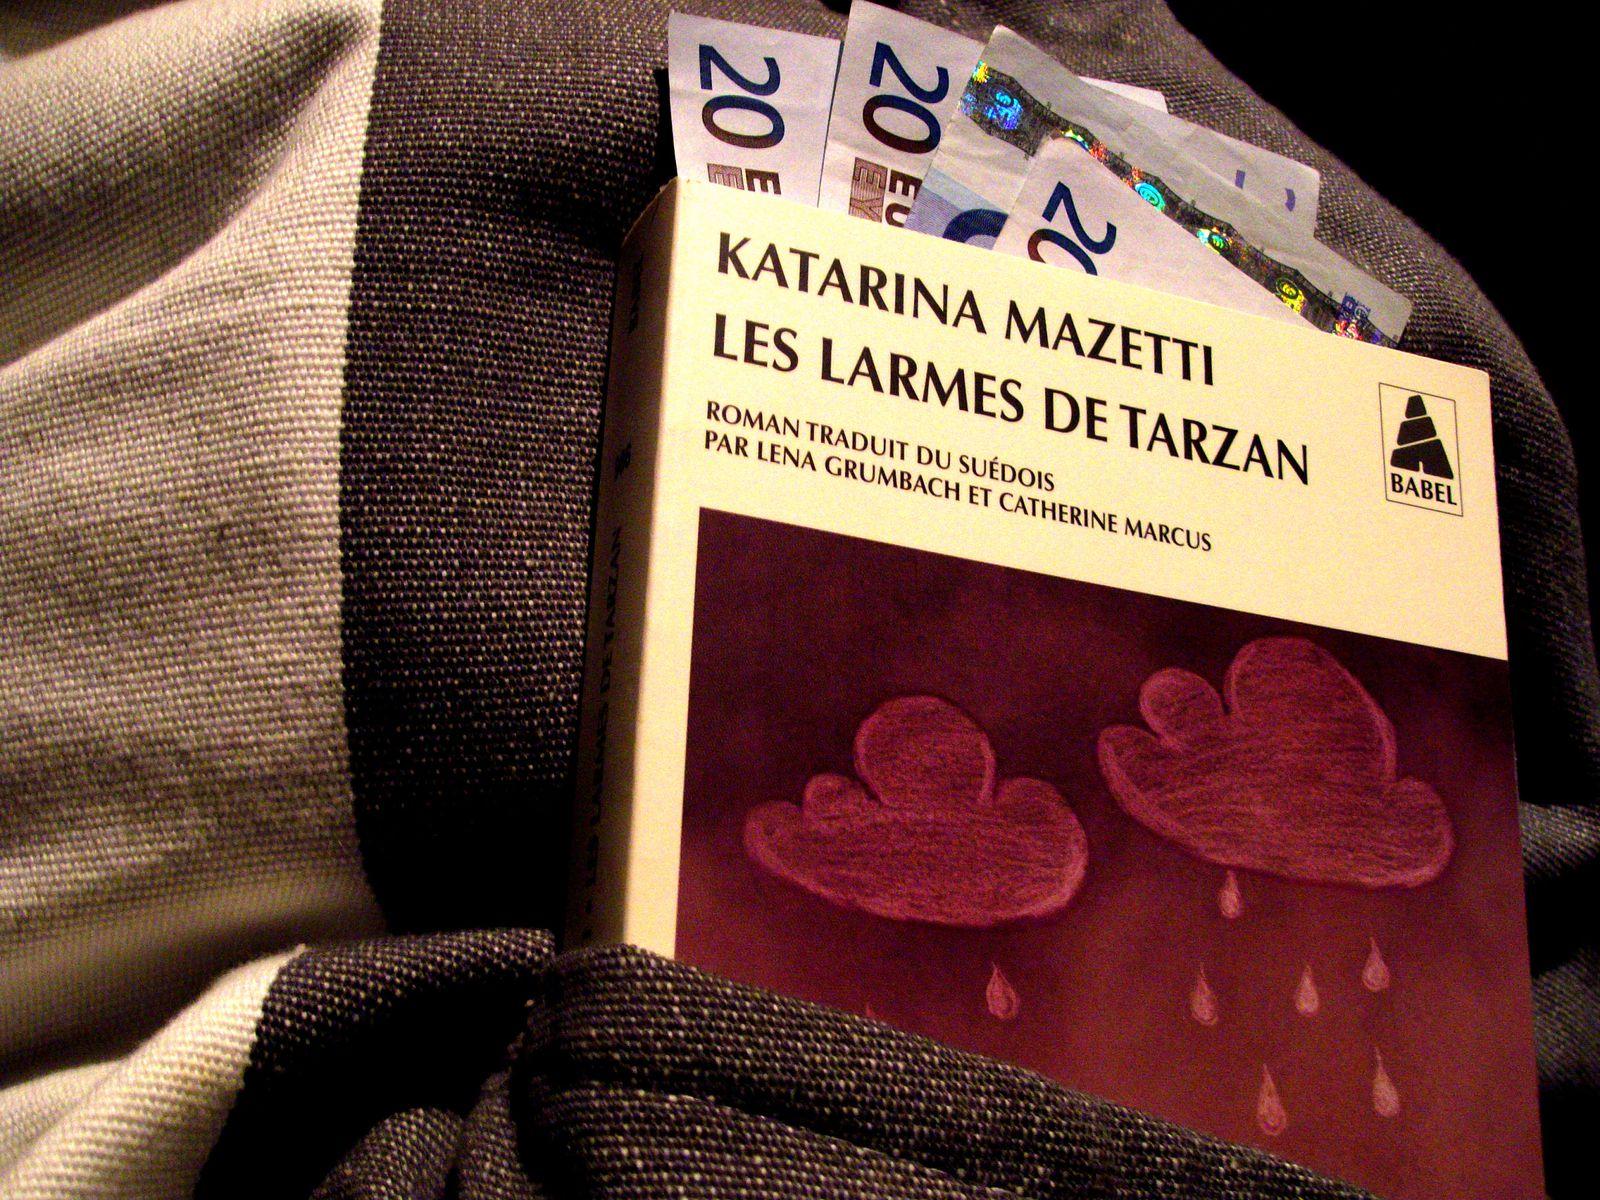 MAZETTI - Les larmes de Tarzan